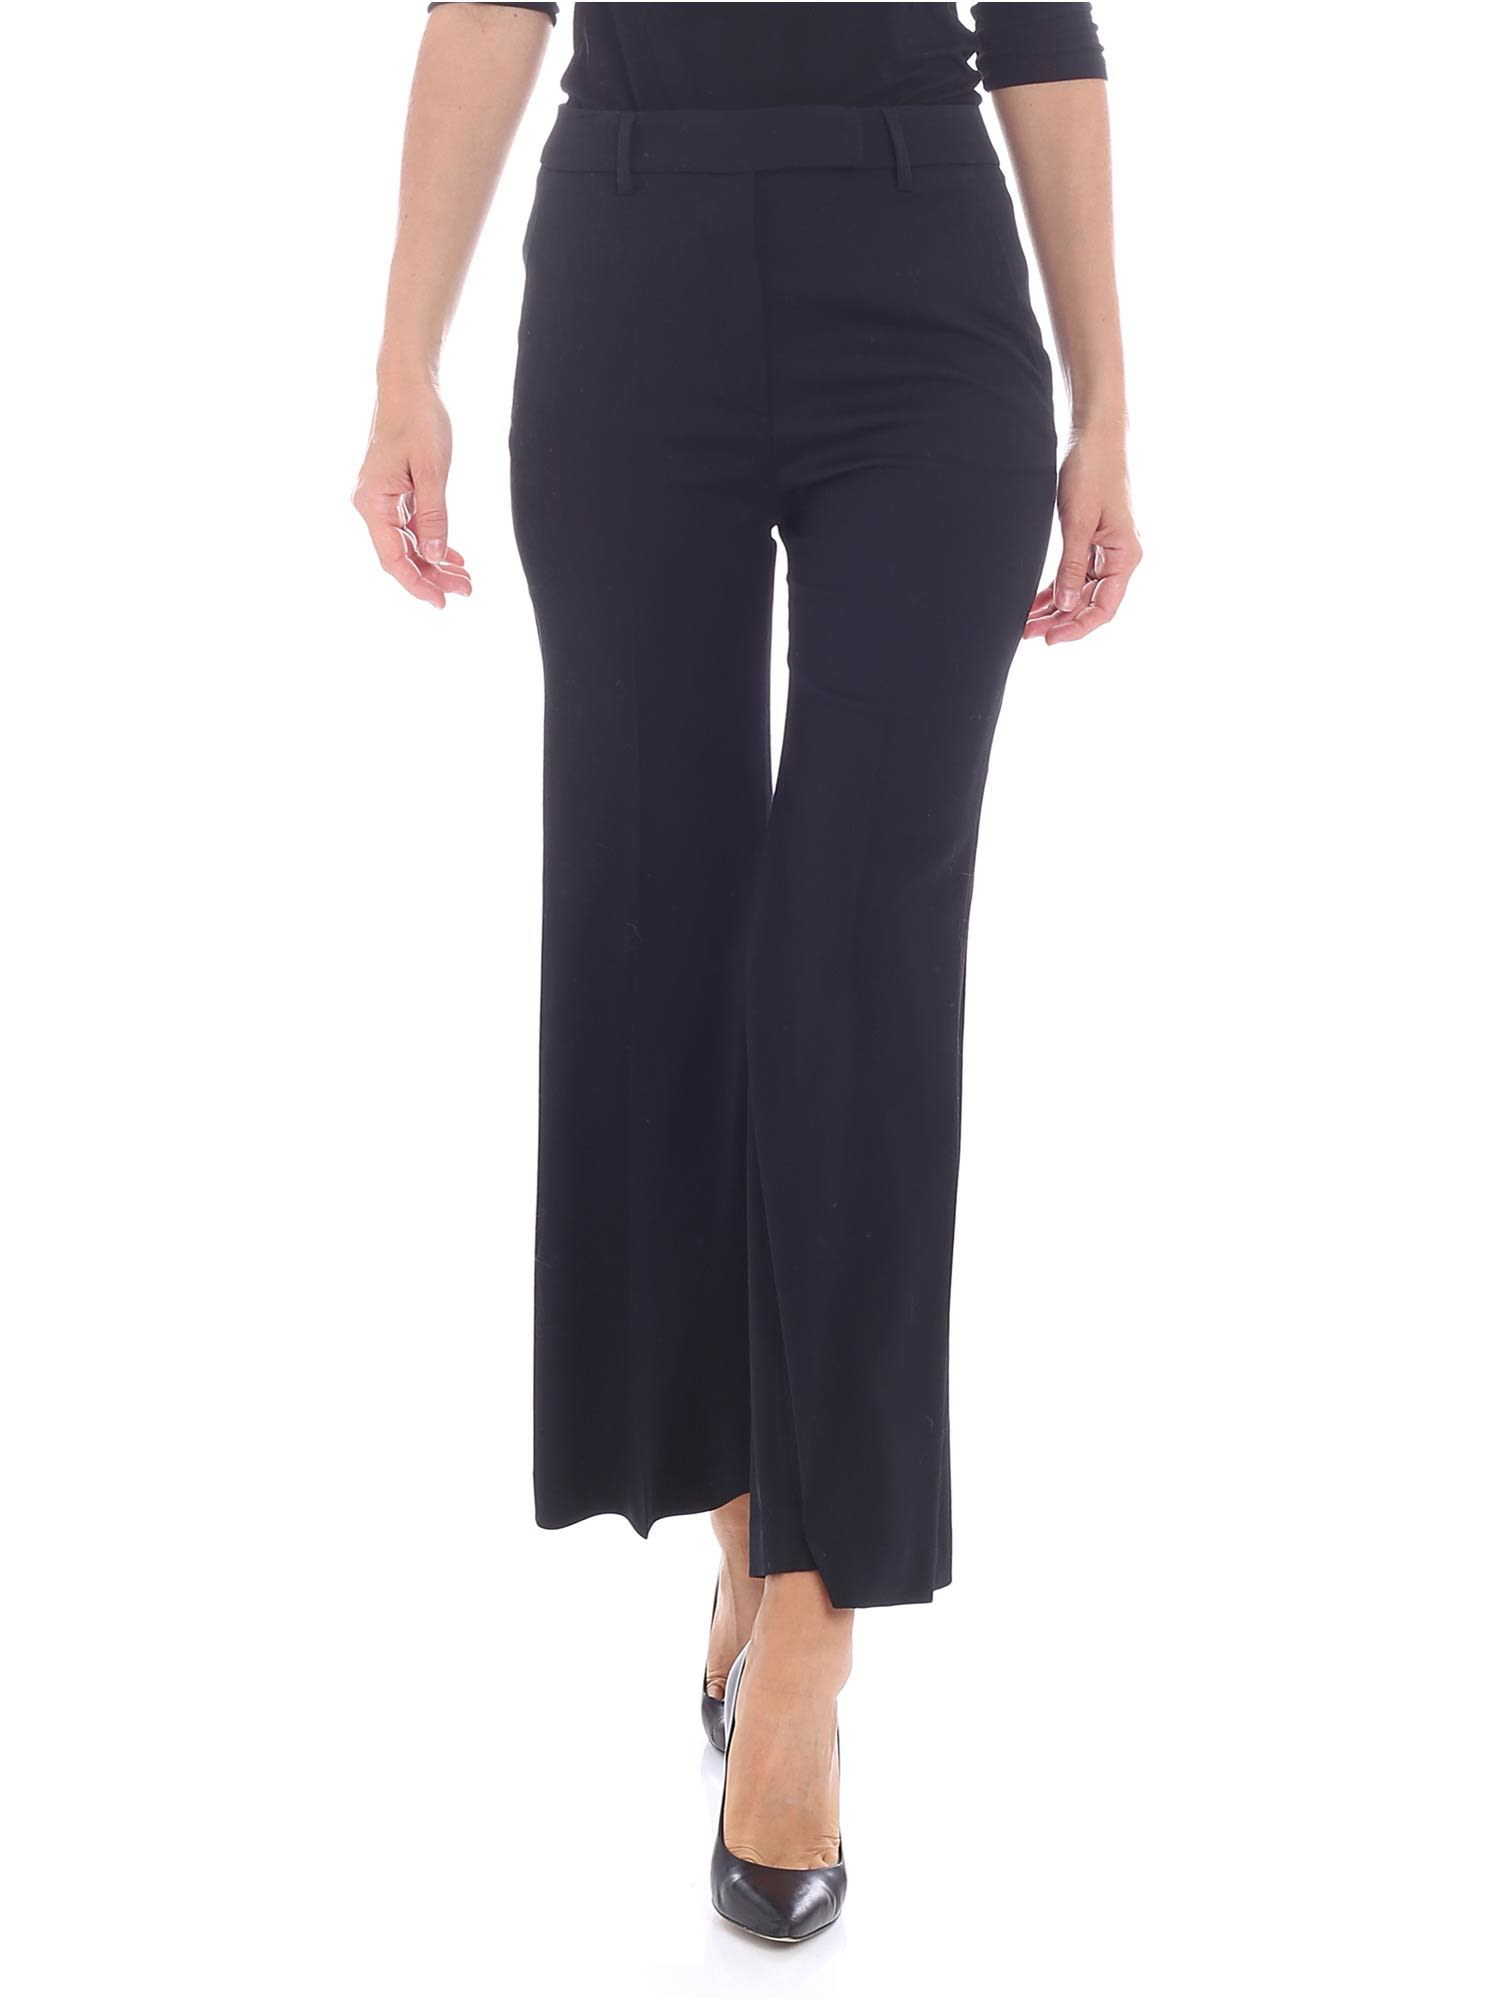 TRUE ROYAL - Nadine Trousers in Black